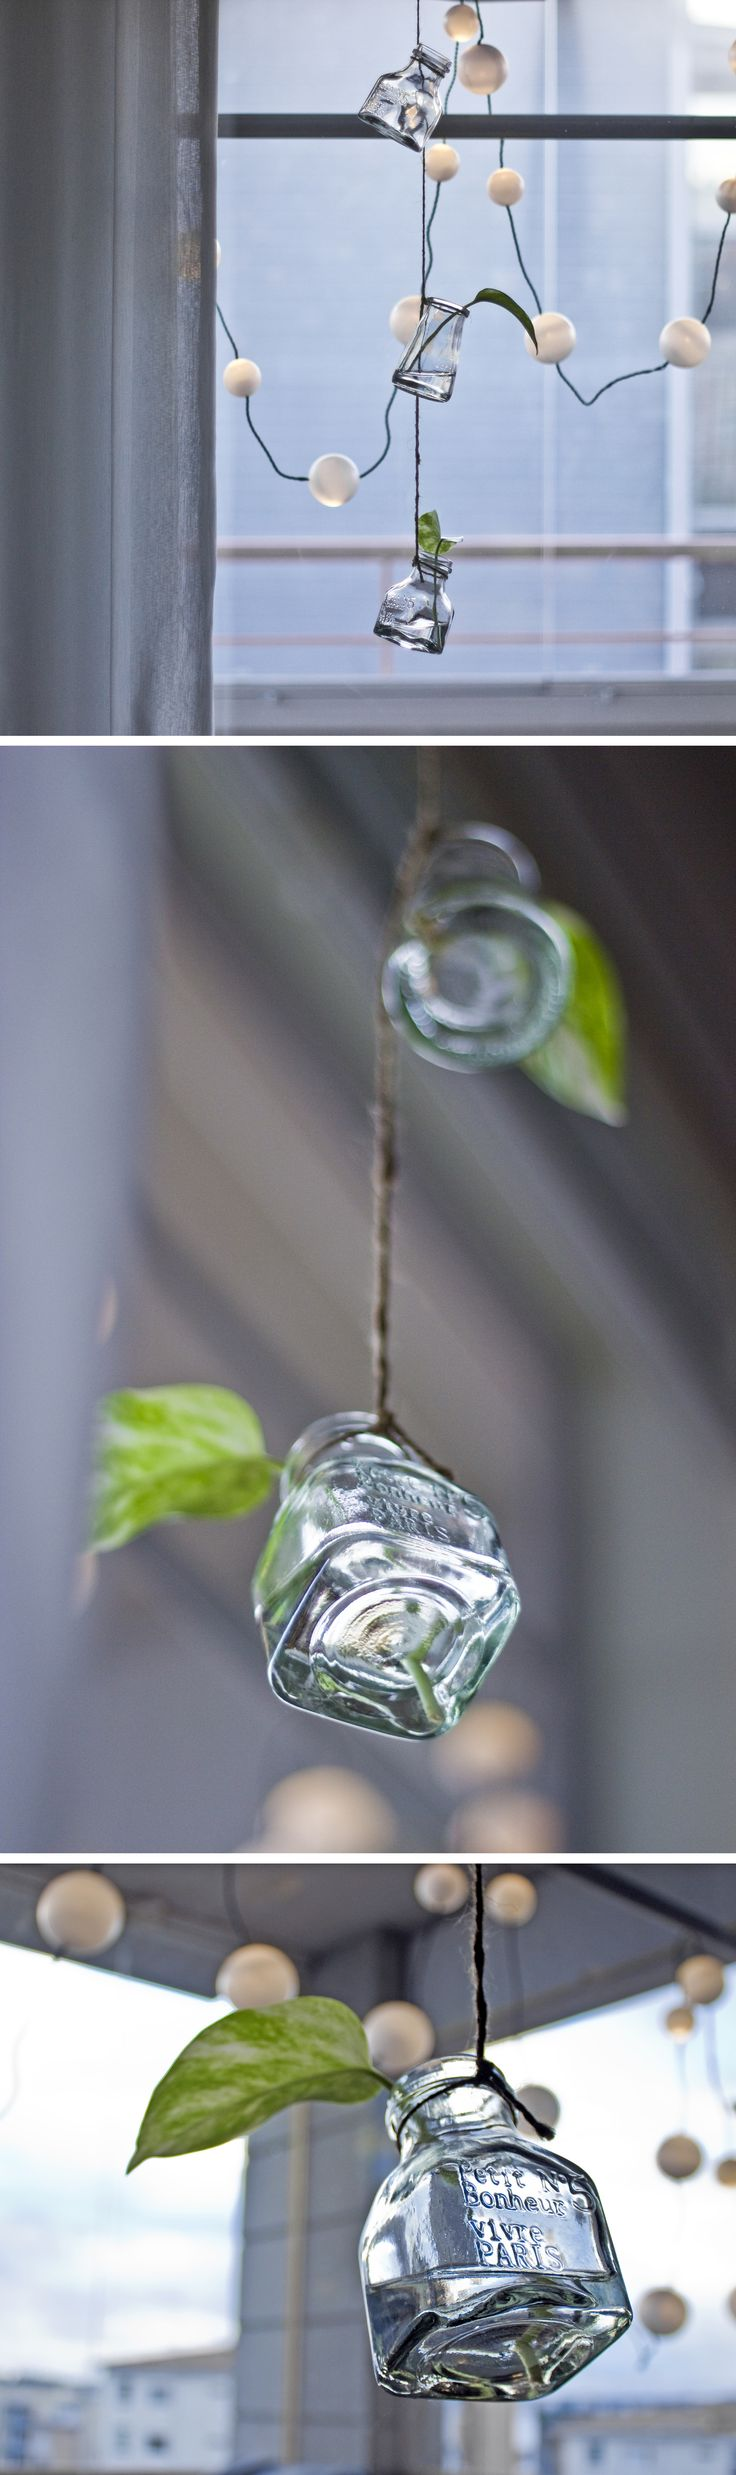 DIY hanging vases for little plants or flowers <3